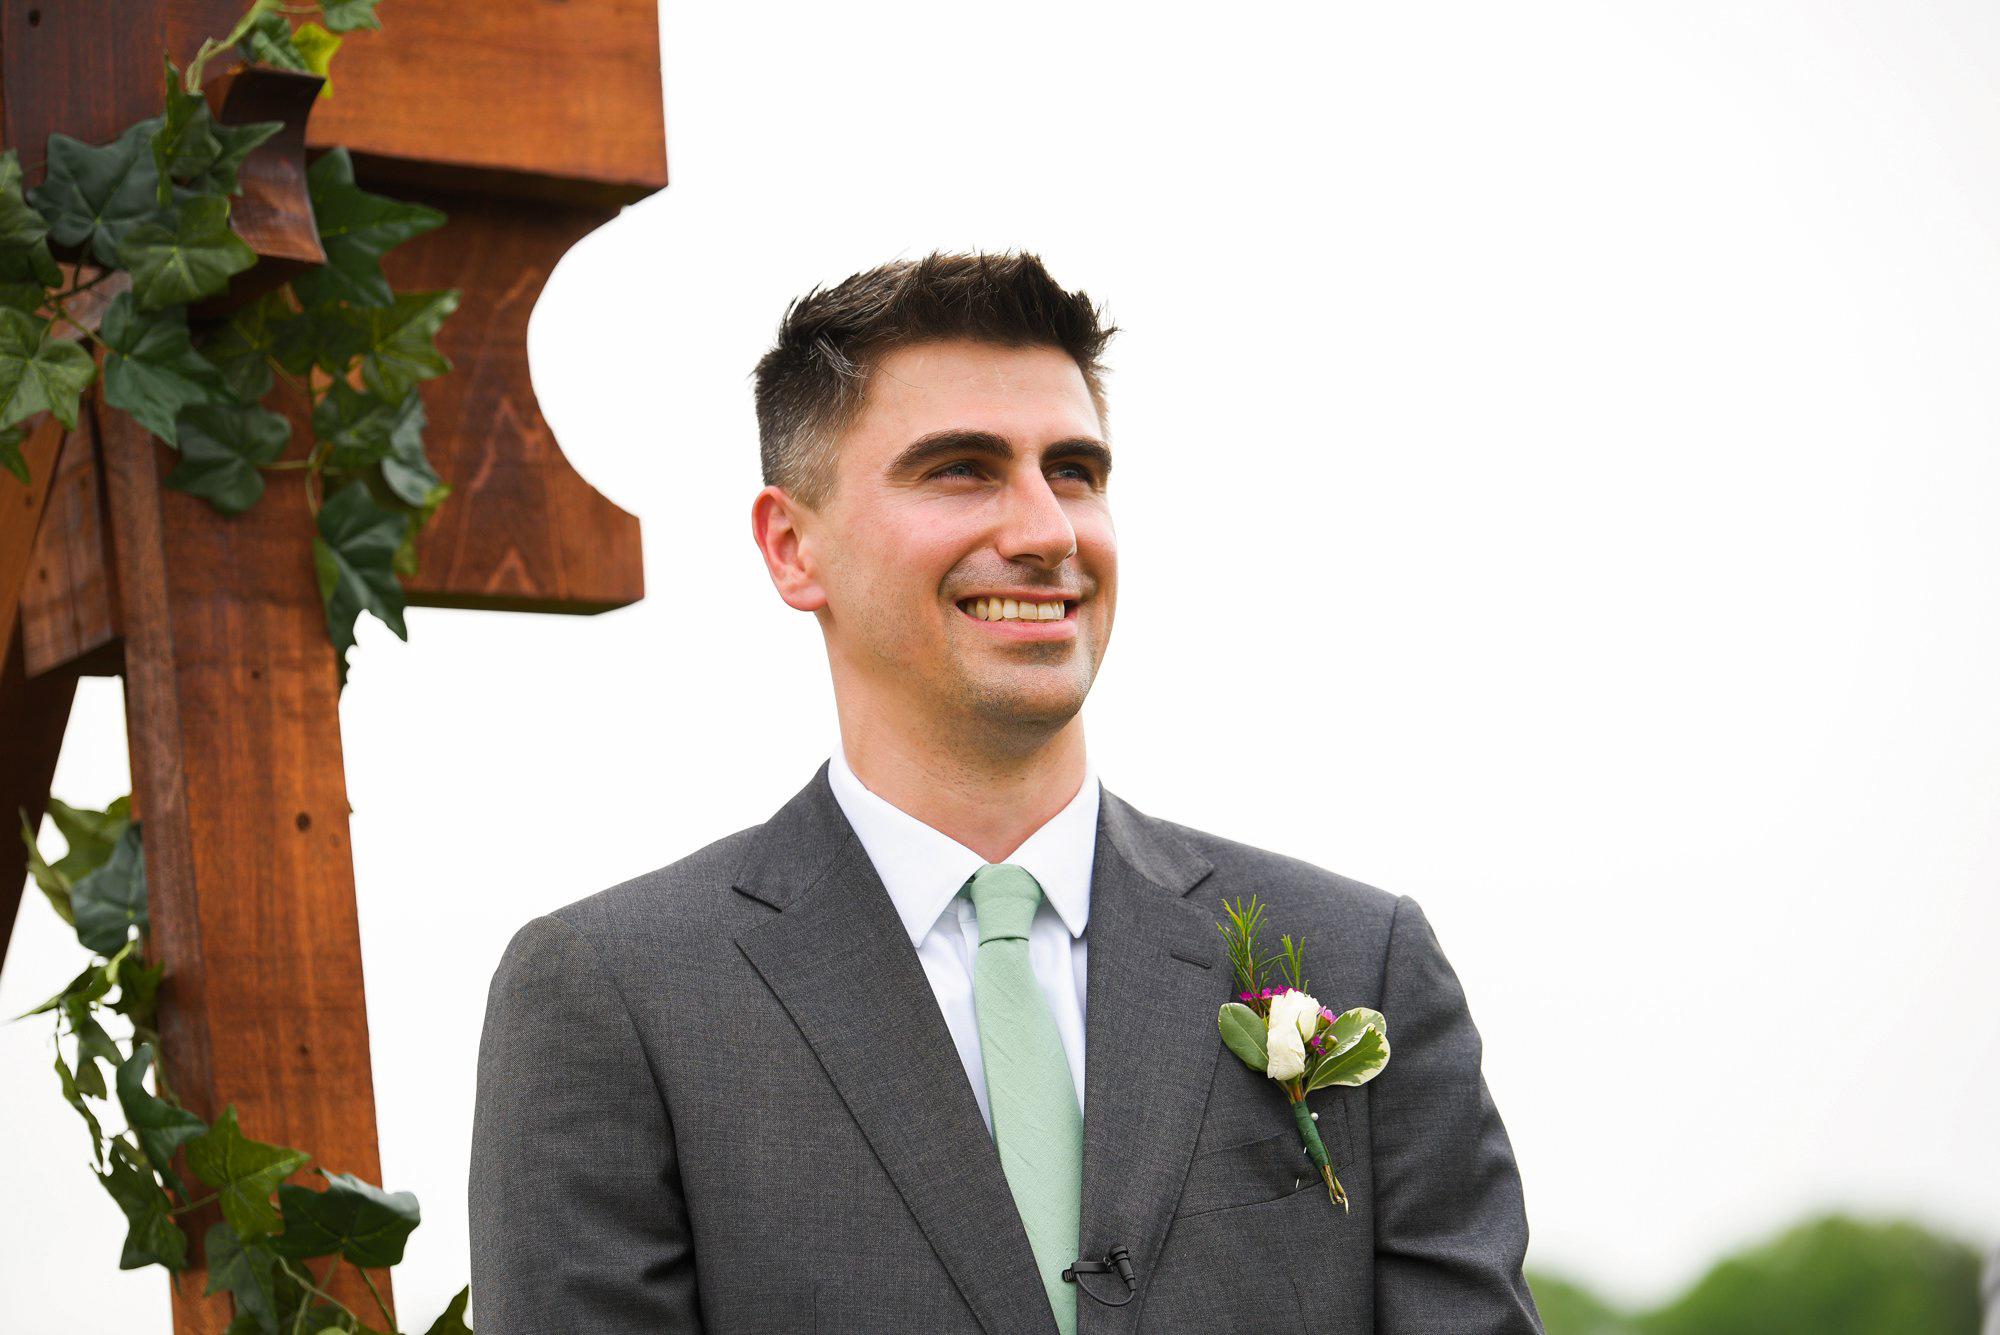 wedding-photography-virginia_0016.jpg